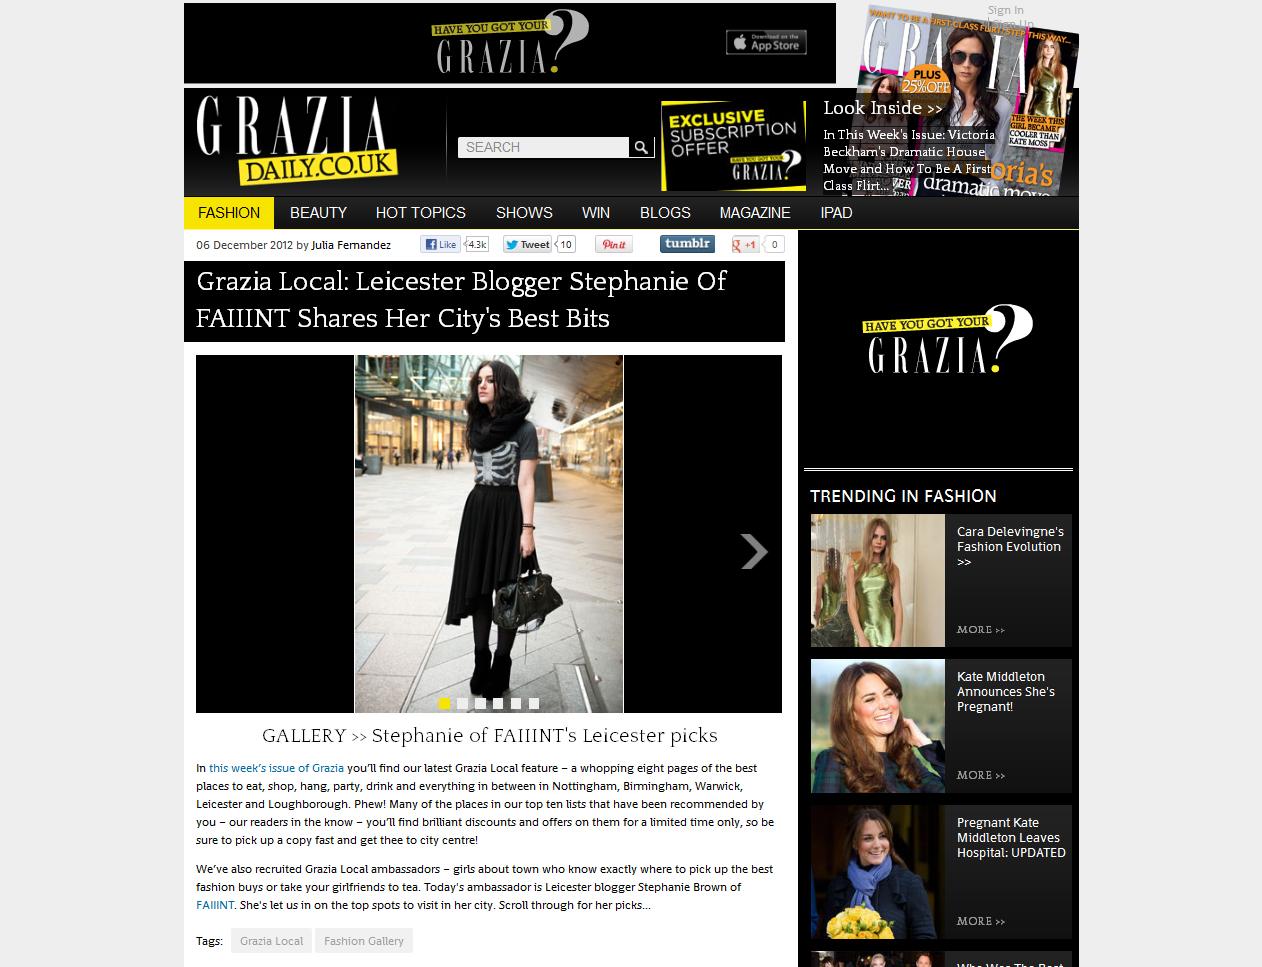 Grazia, Grazia Daily, Local, Ambassador, Regional, Specials, FAIIINT, Stephanie Brown, Leicester, Feature, Blog, Post, Press